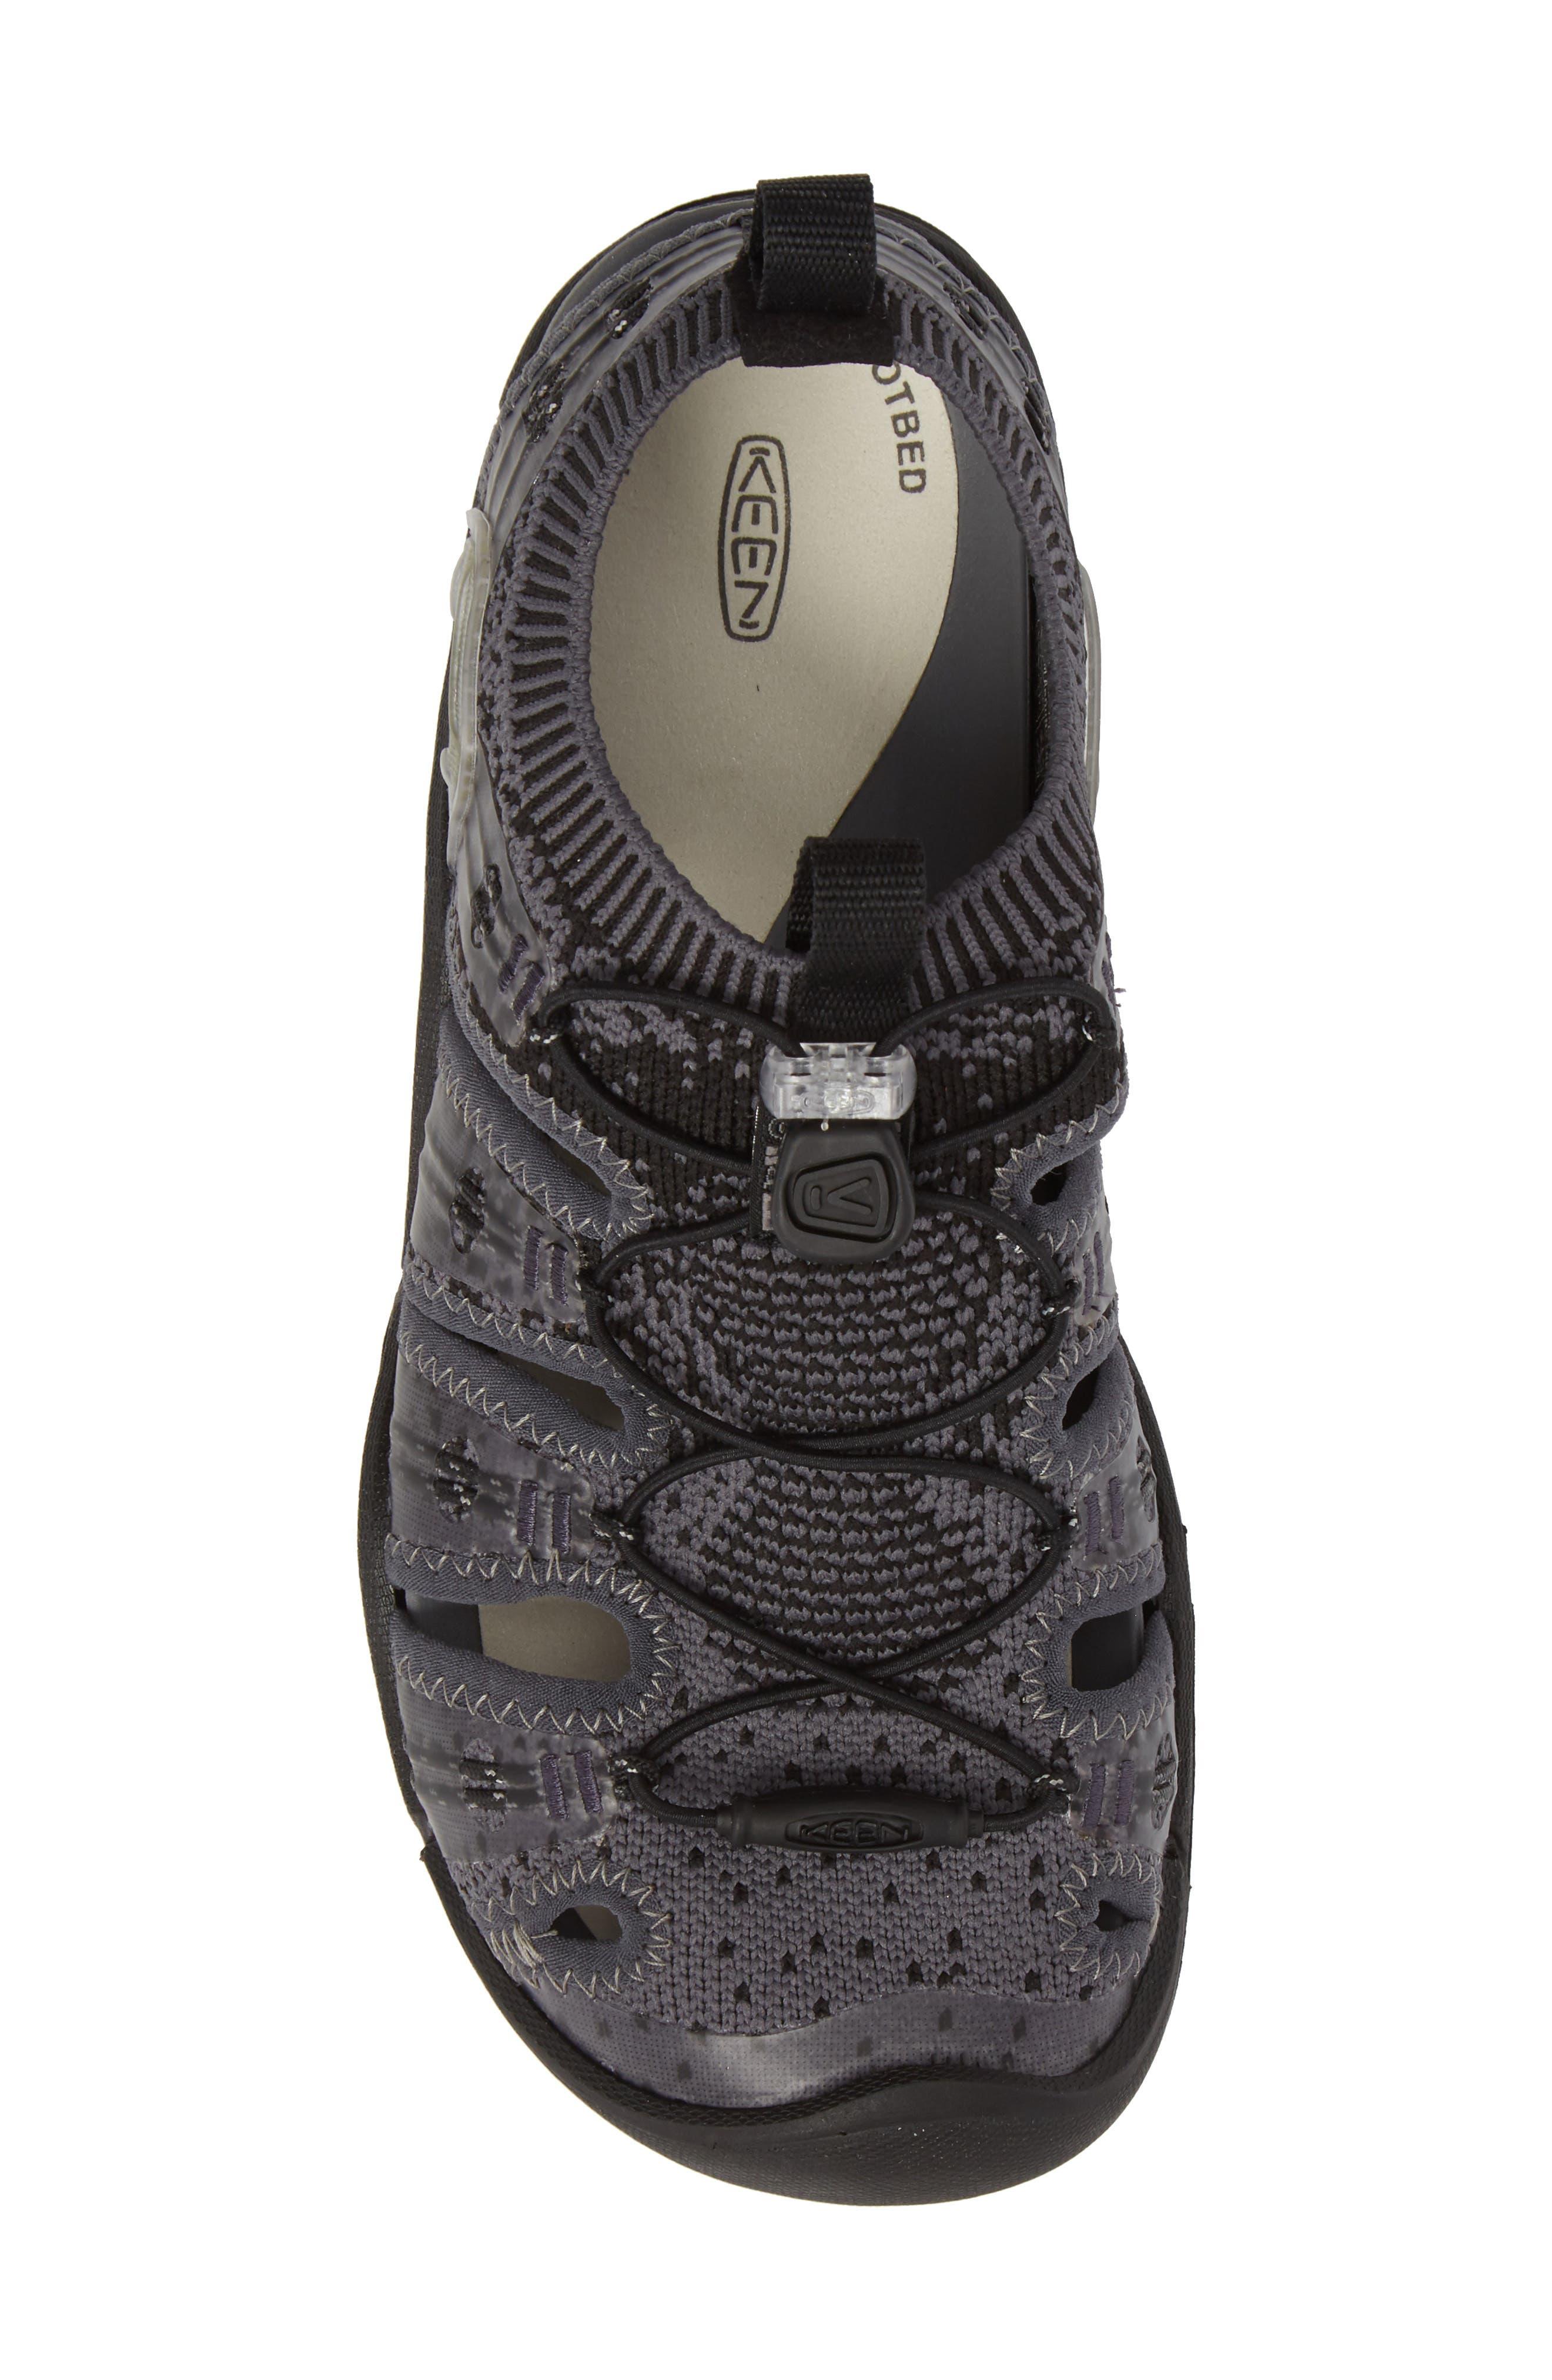 EVOFIT One Sandal,                             Alternate thumbnail 5, color,                             Heathered Black/ Magnet